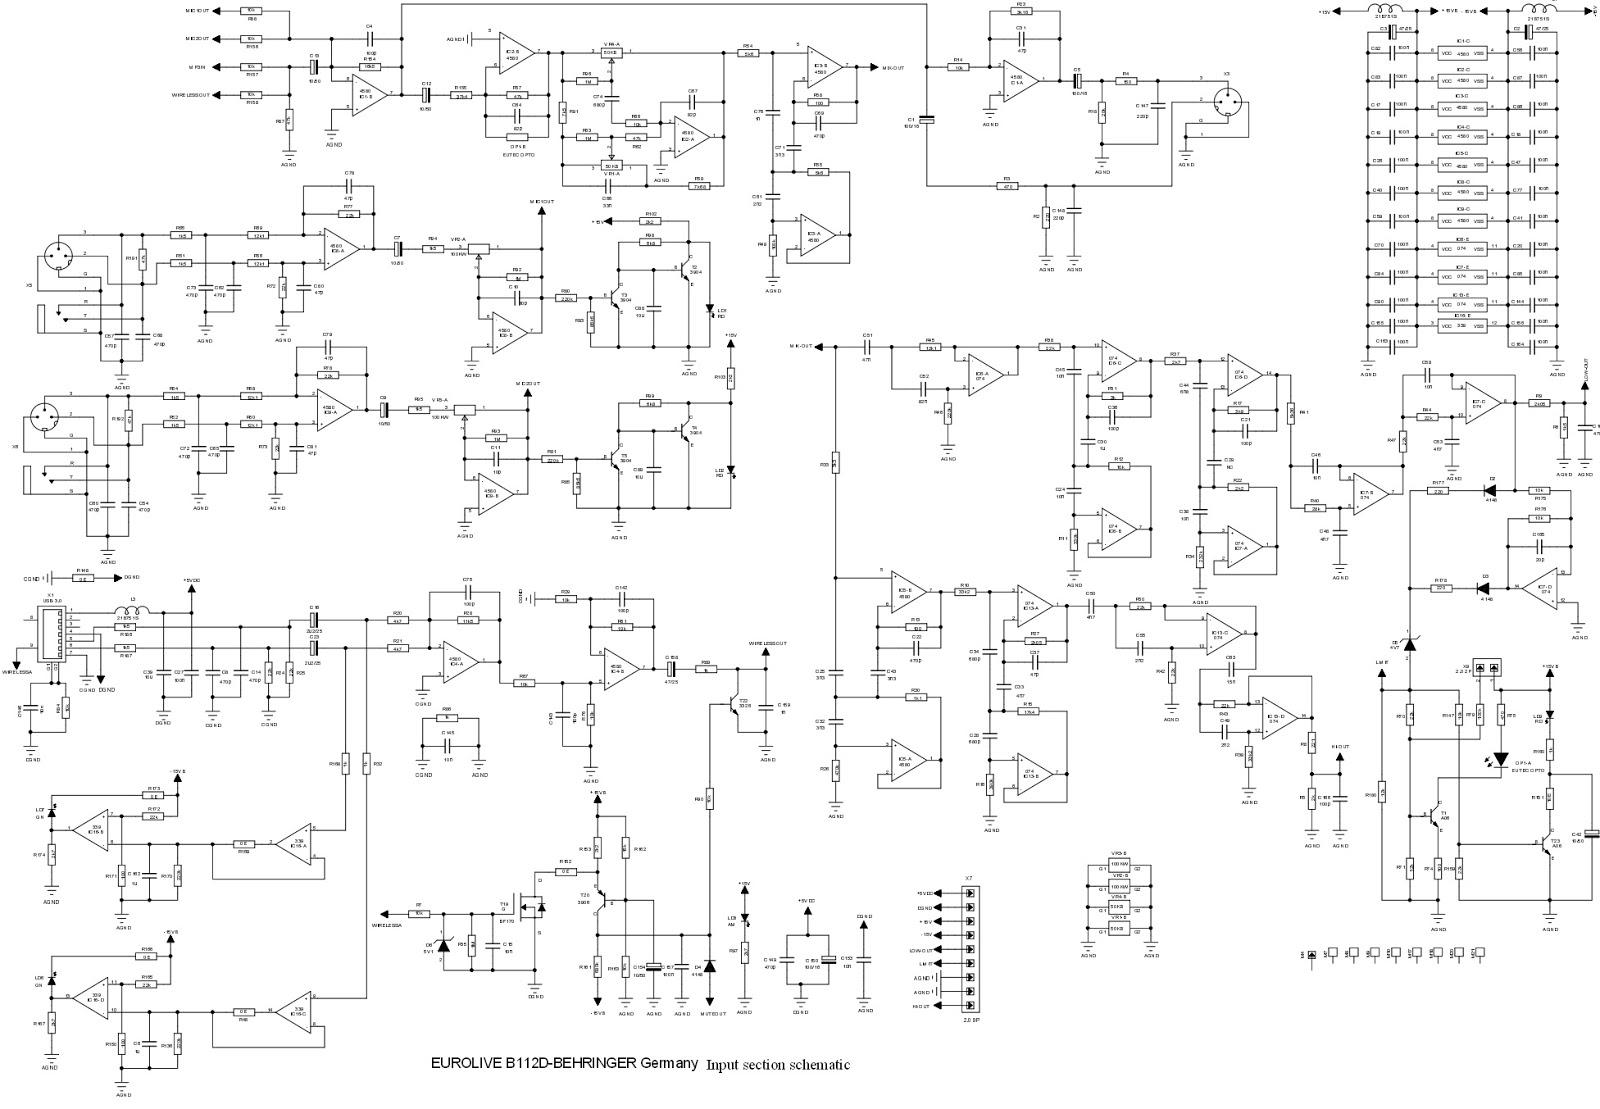 behringer pa system wiring diagram pa system setup diagram pa pa eurolive b112d behringer germany [ 1600 x 1109 Pixel ]